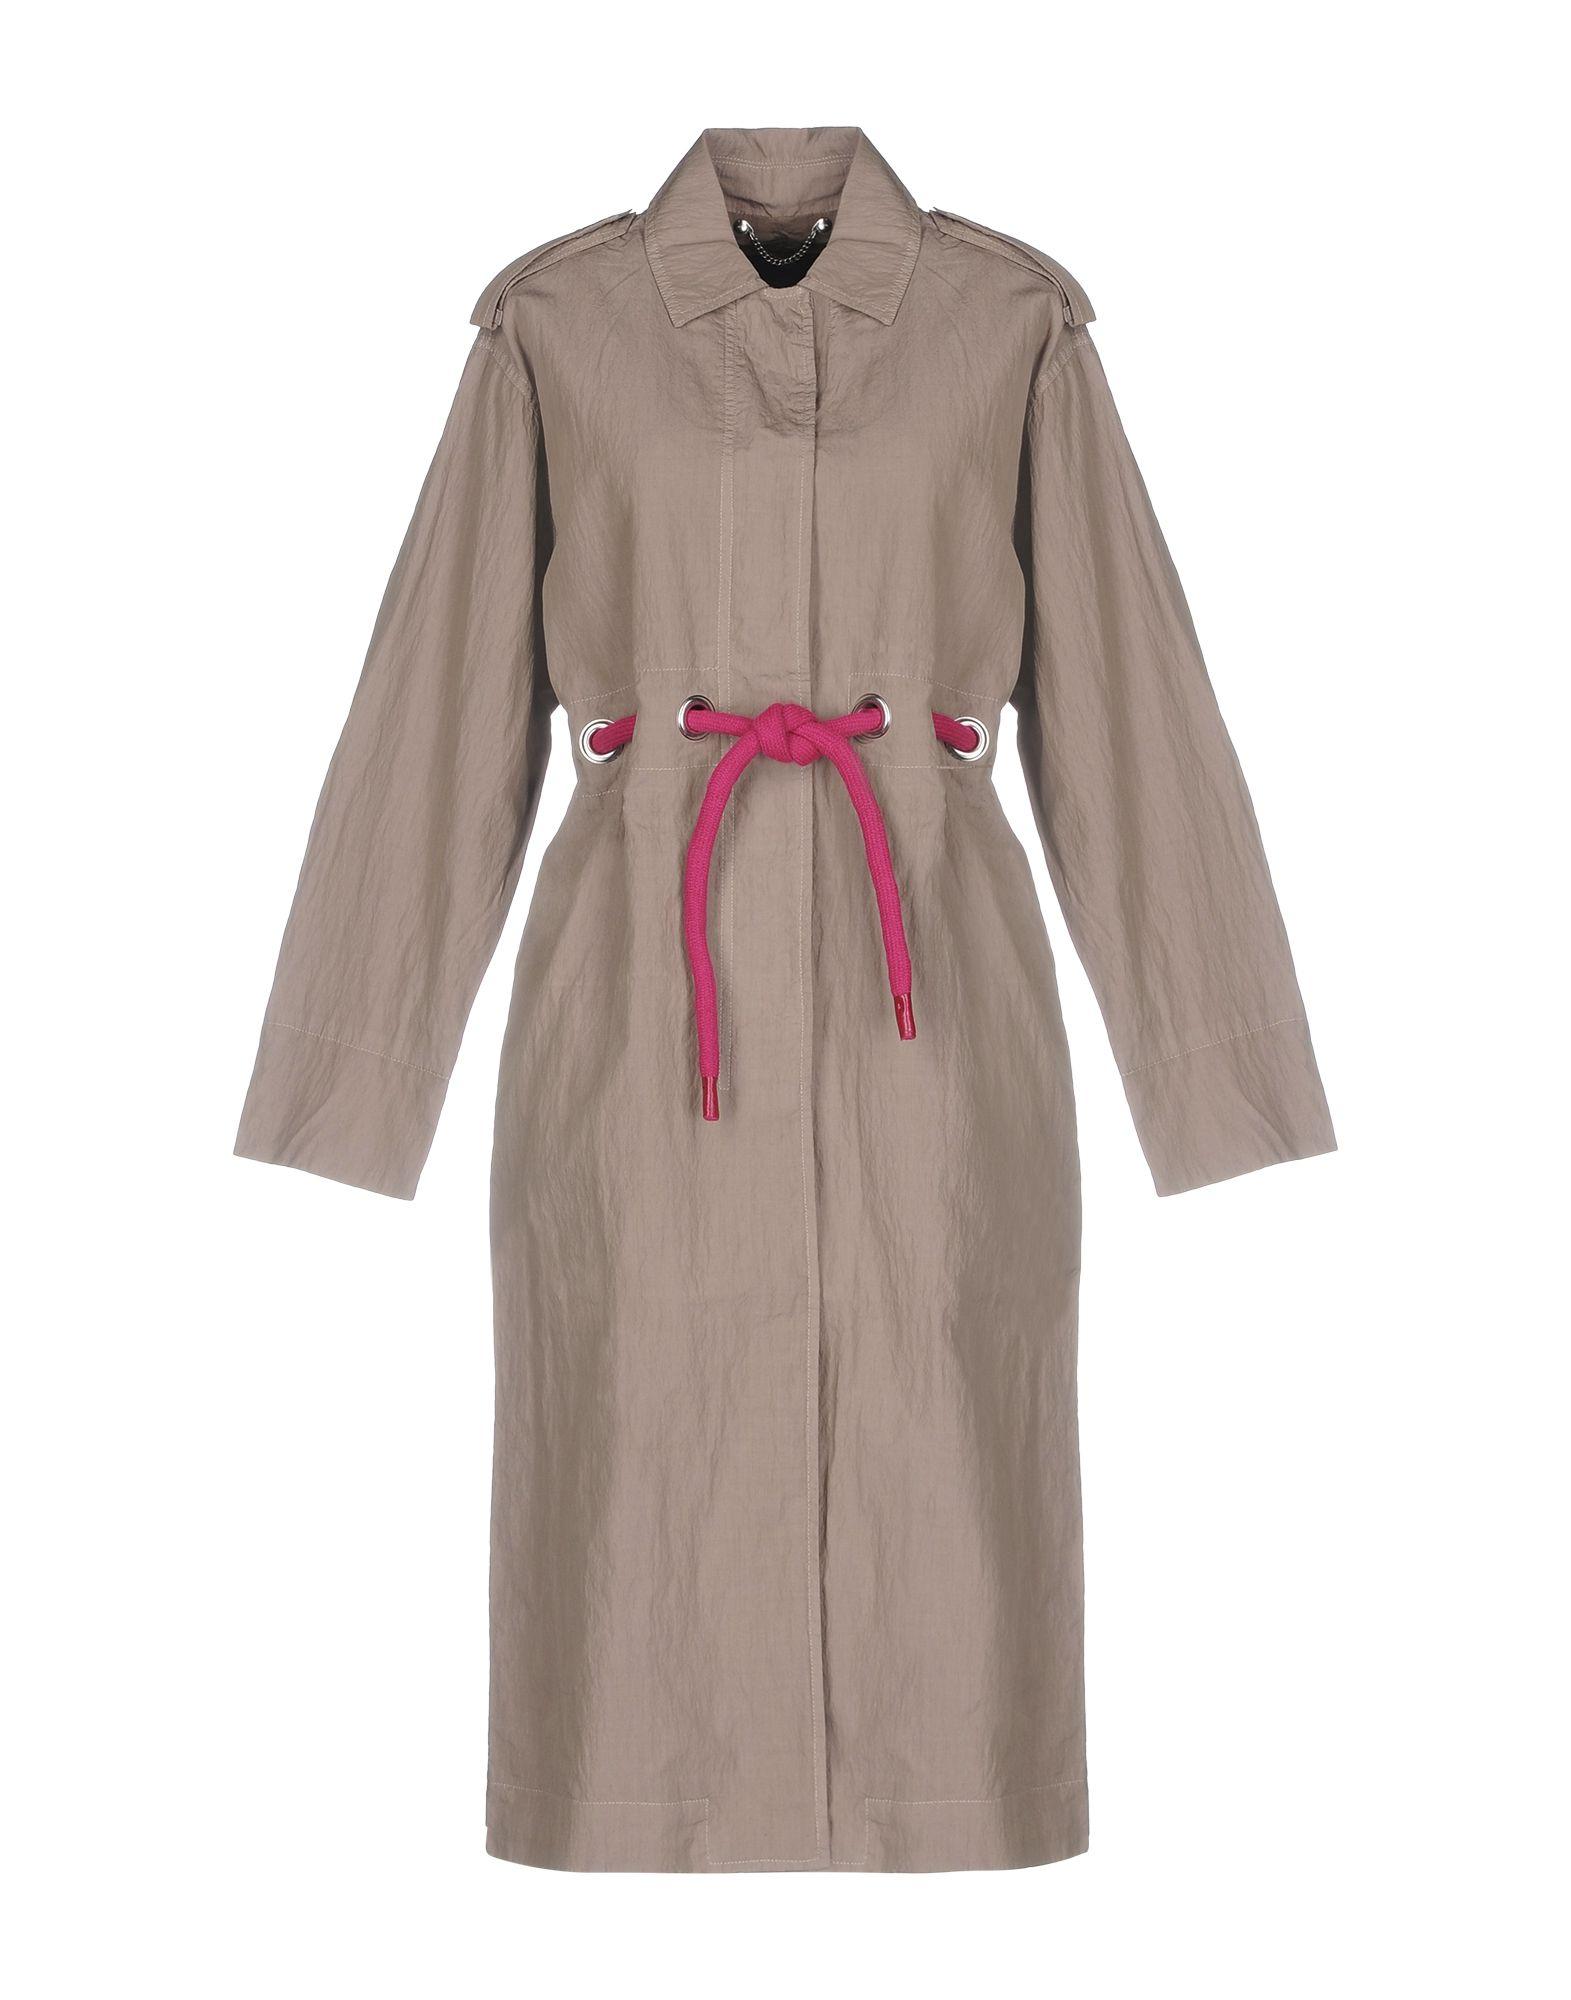 Belted Coats, Beige